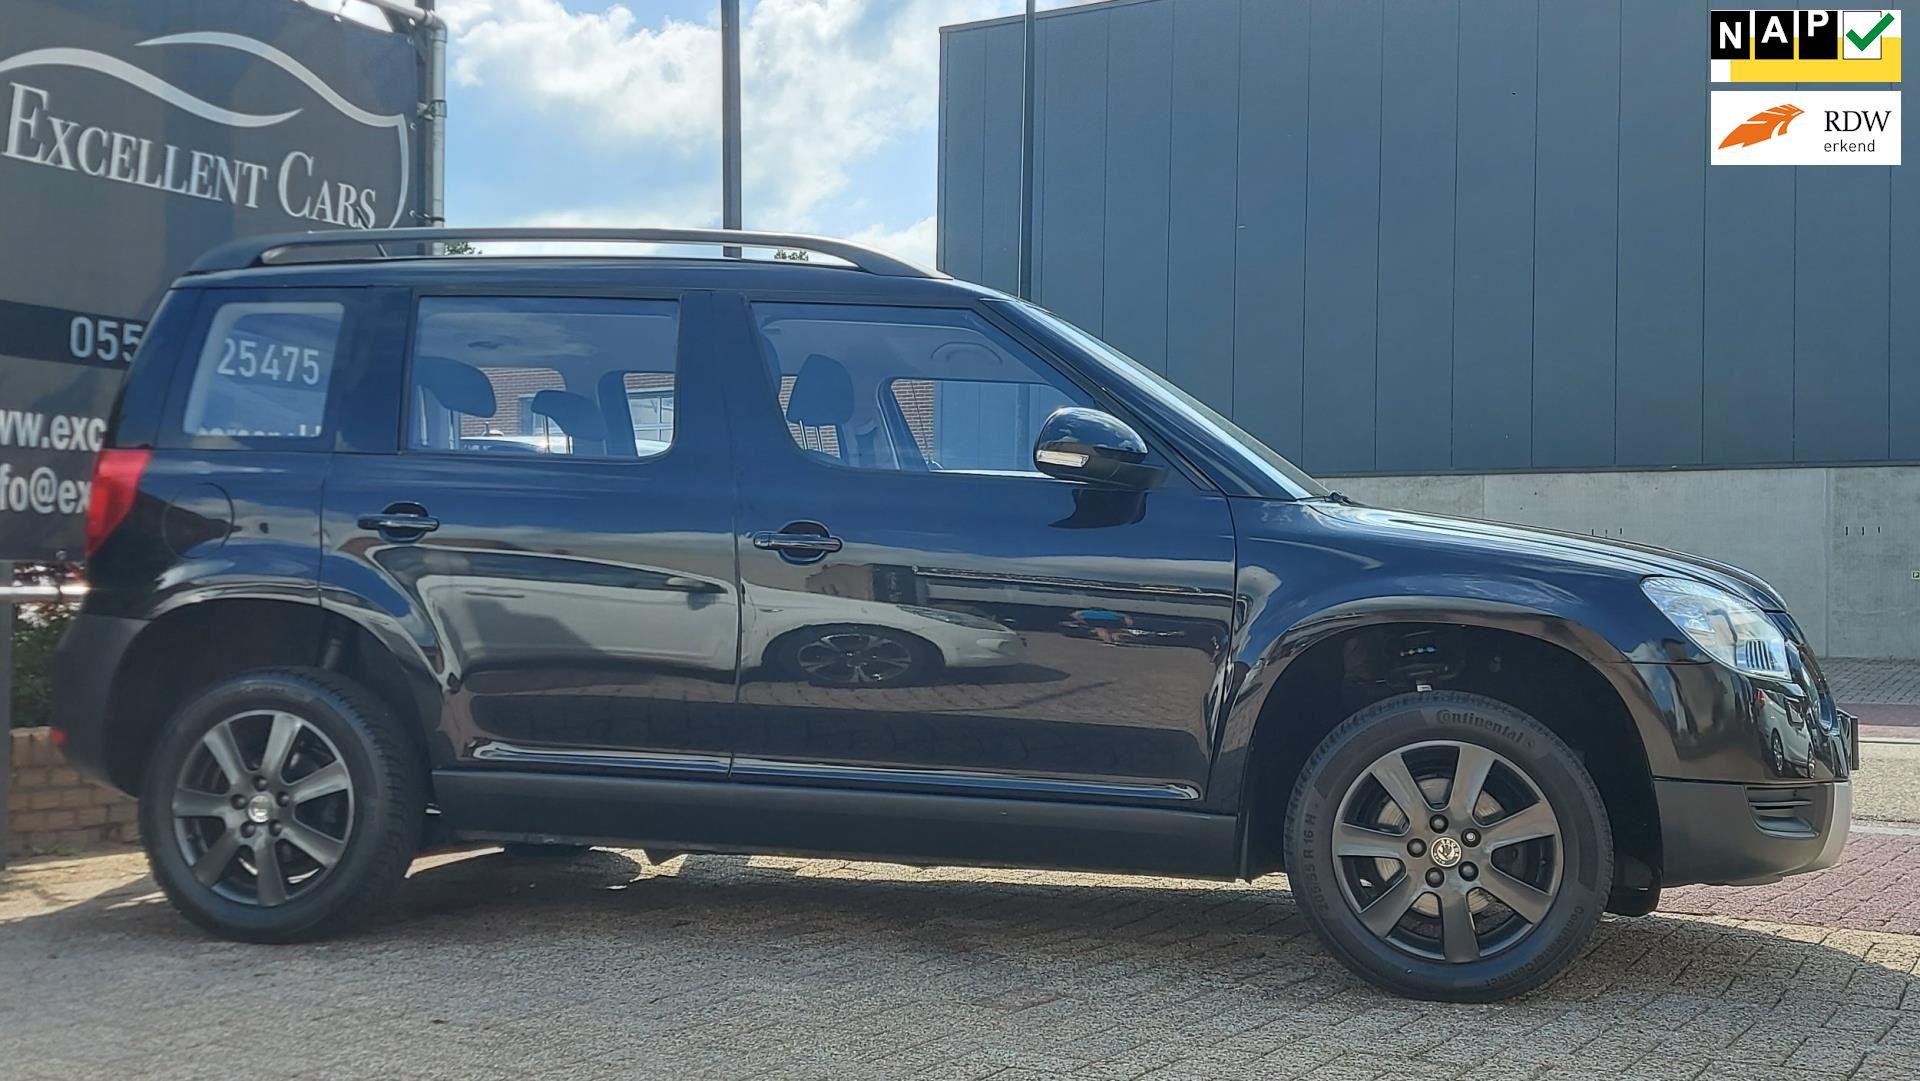 Skoda Yeti occasion - Excellent Cars